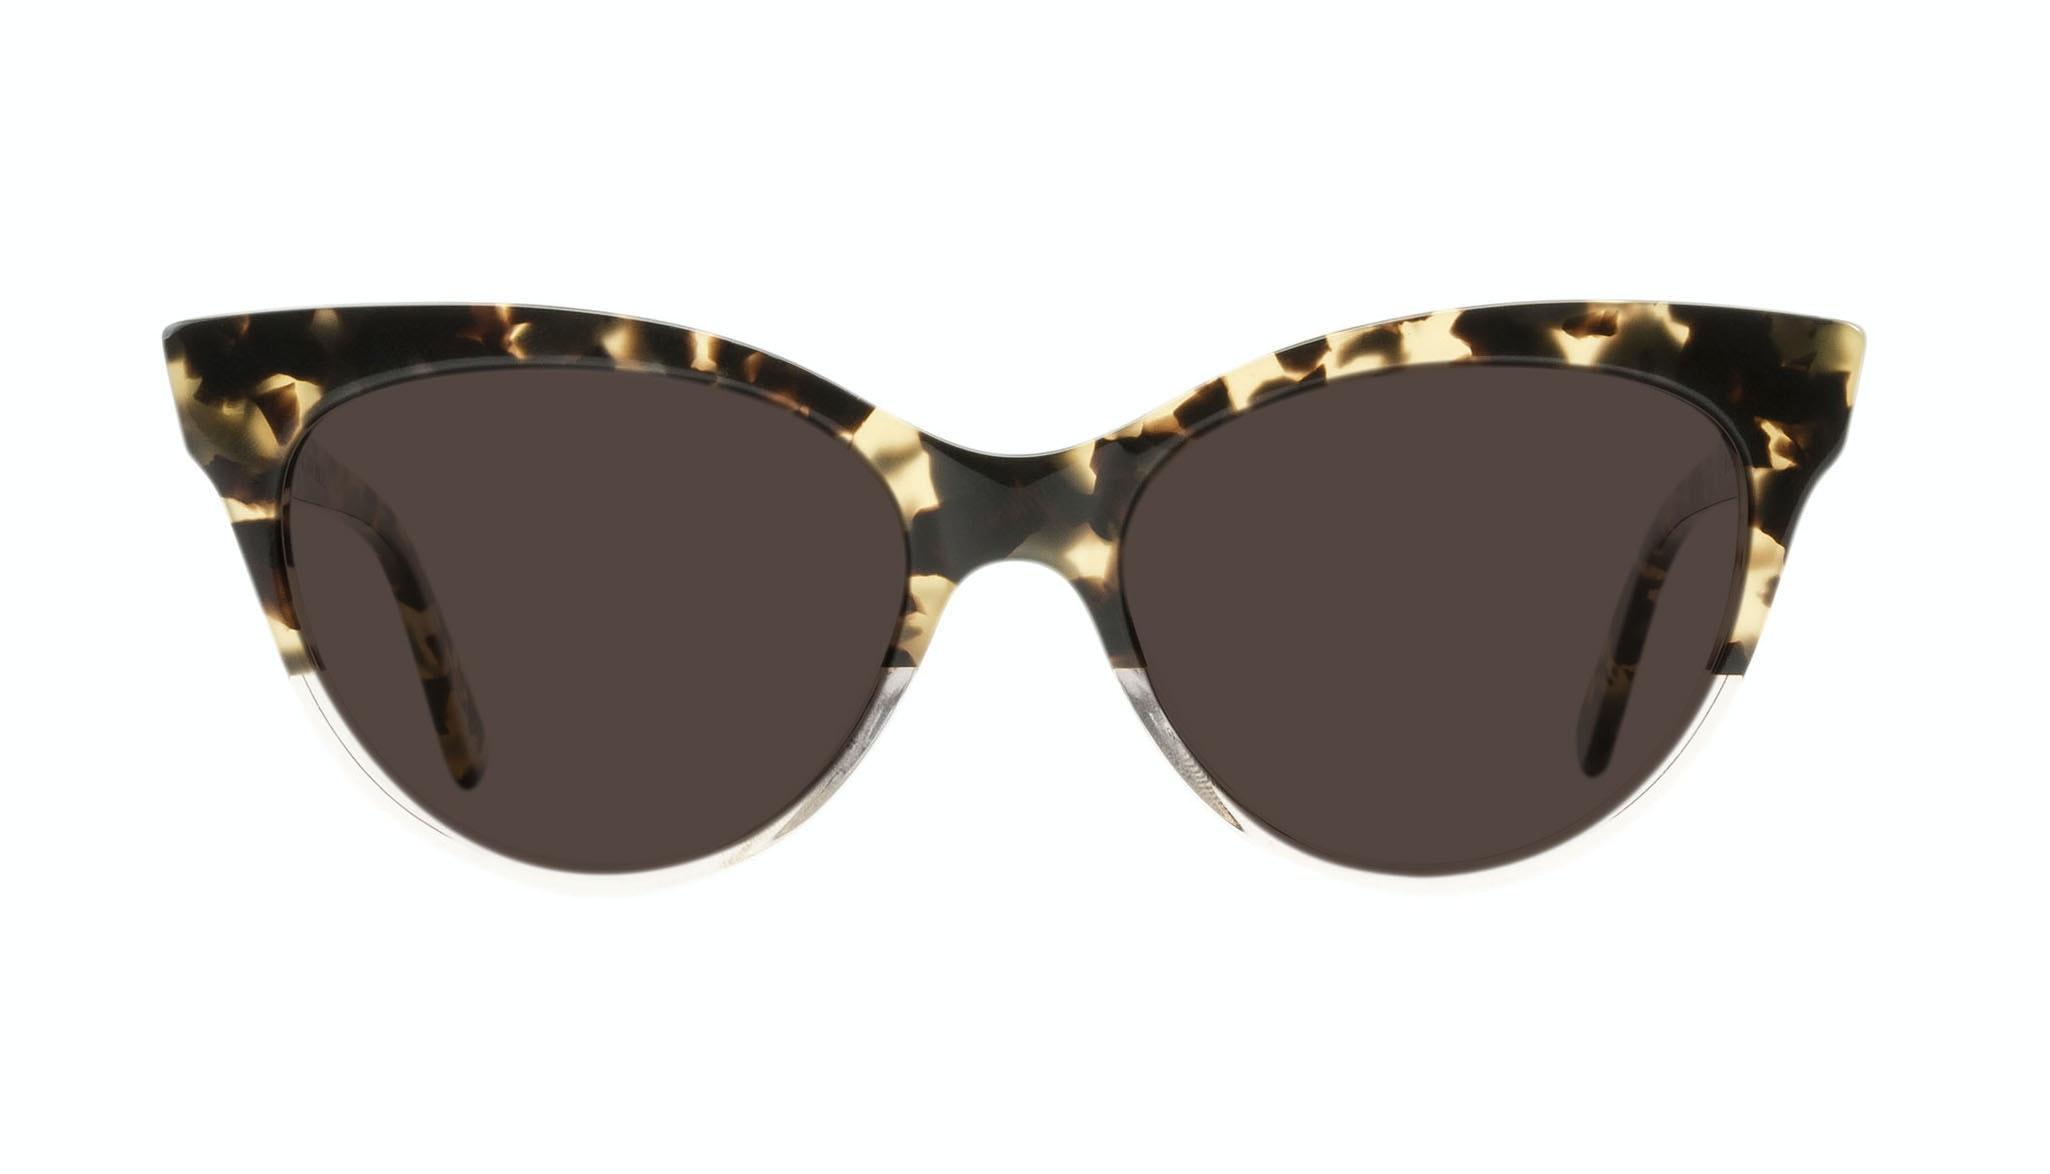 Affordable Fashion Glasses Cat Eye Sunglasses Women SkunkBoy Champagne Tort